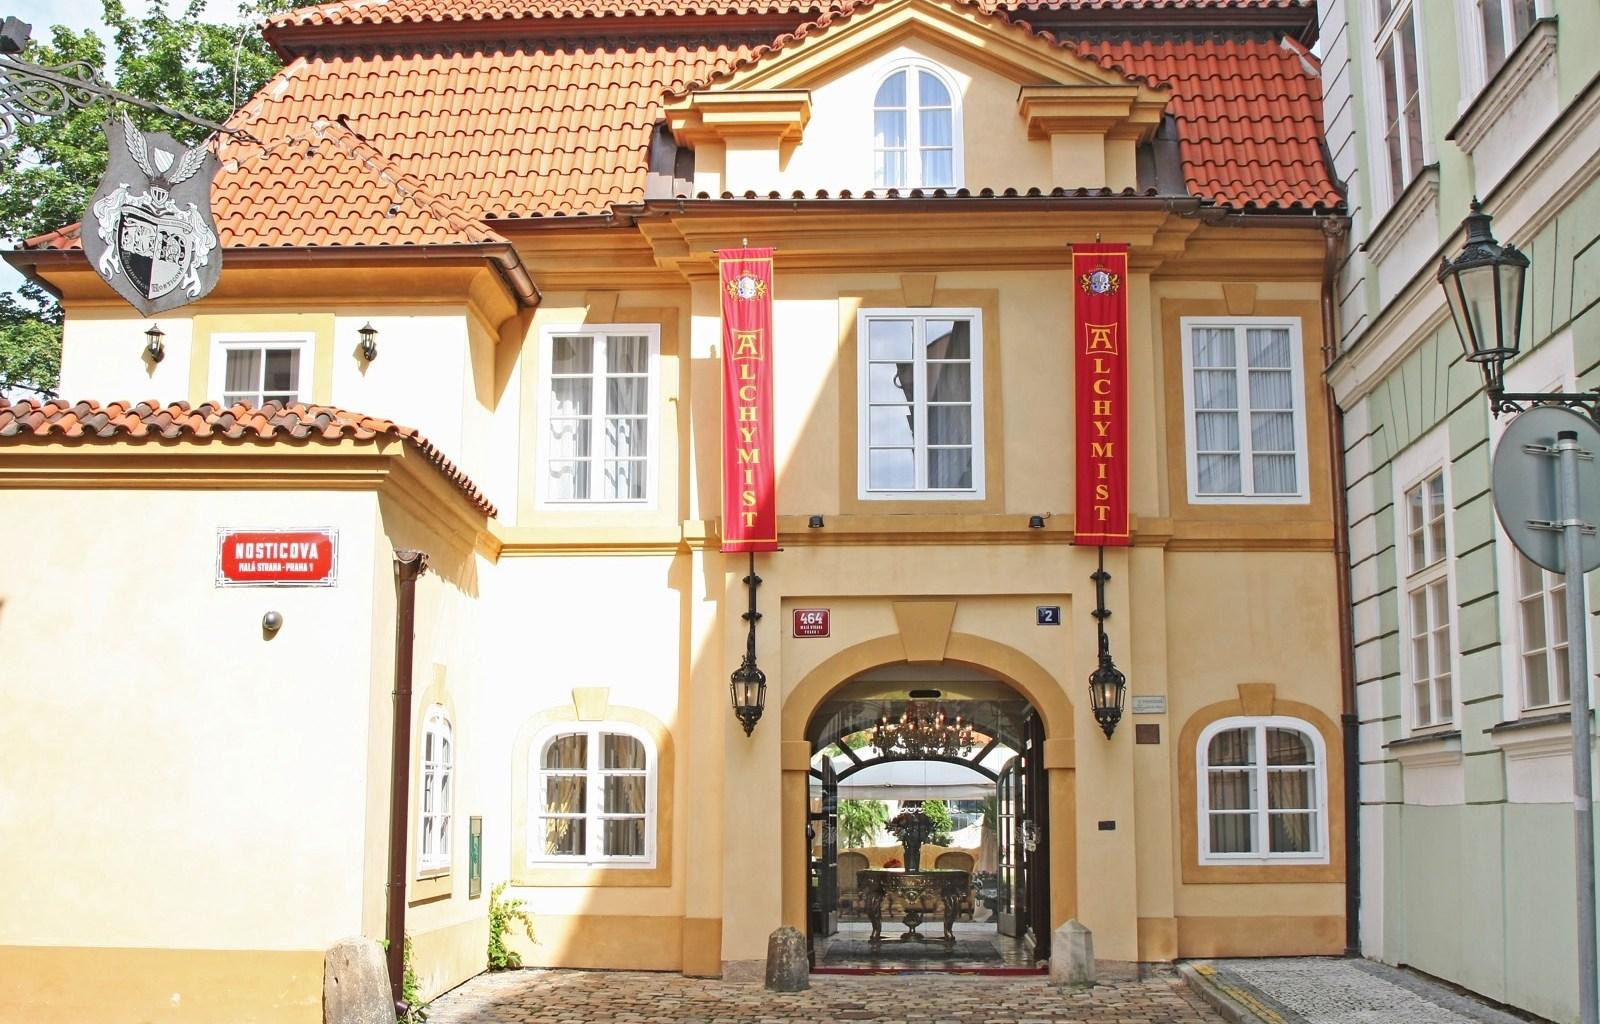 Alchymist nosticova palace отель